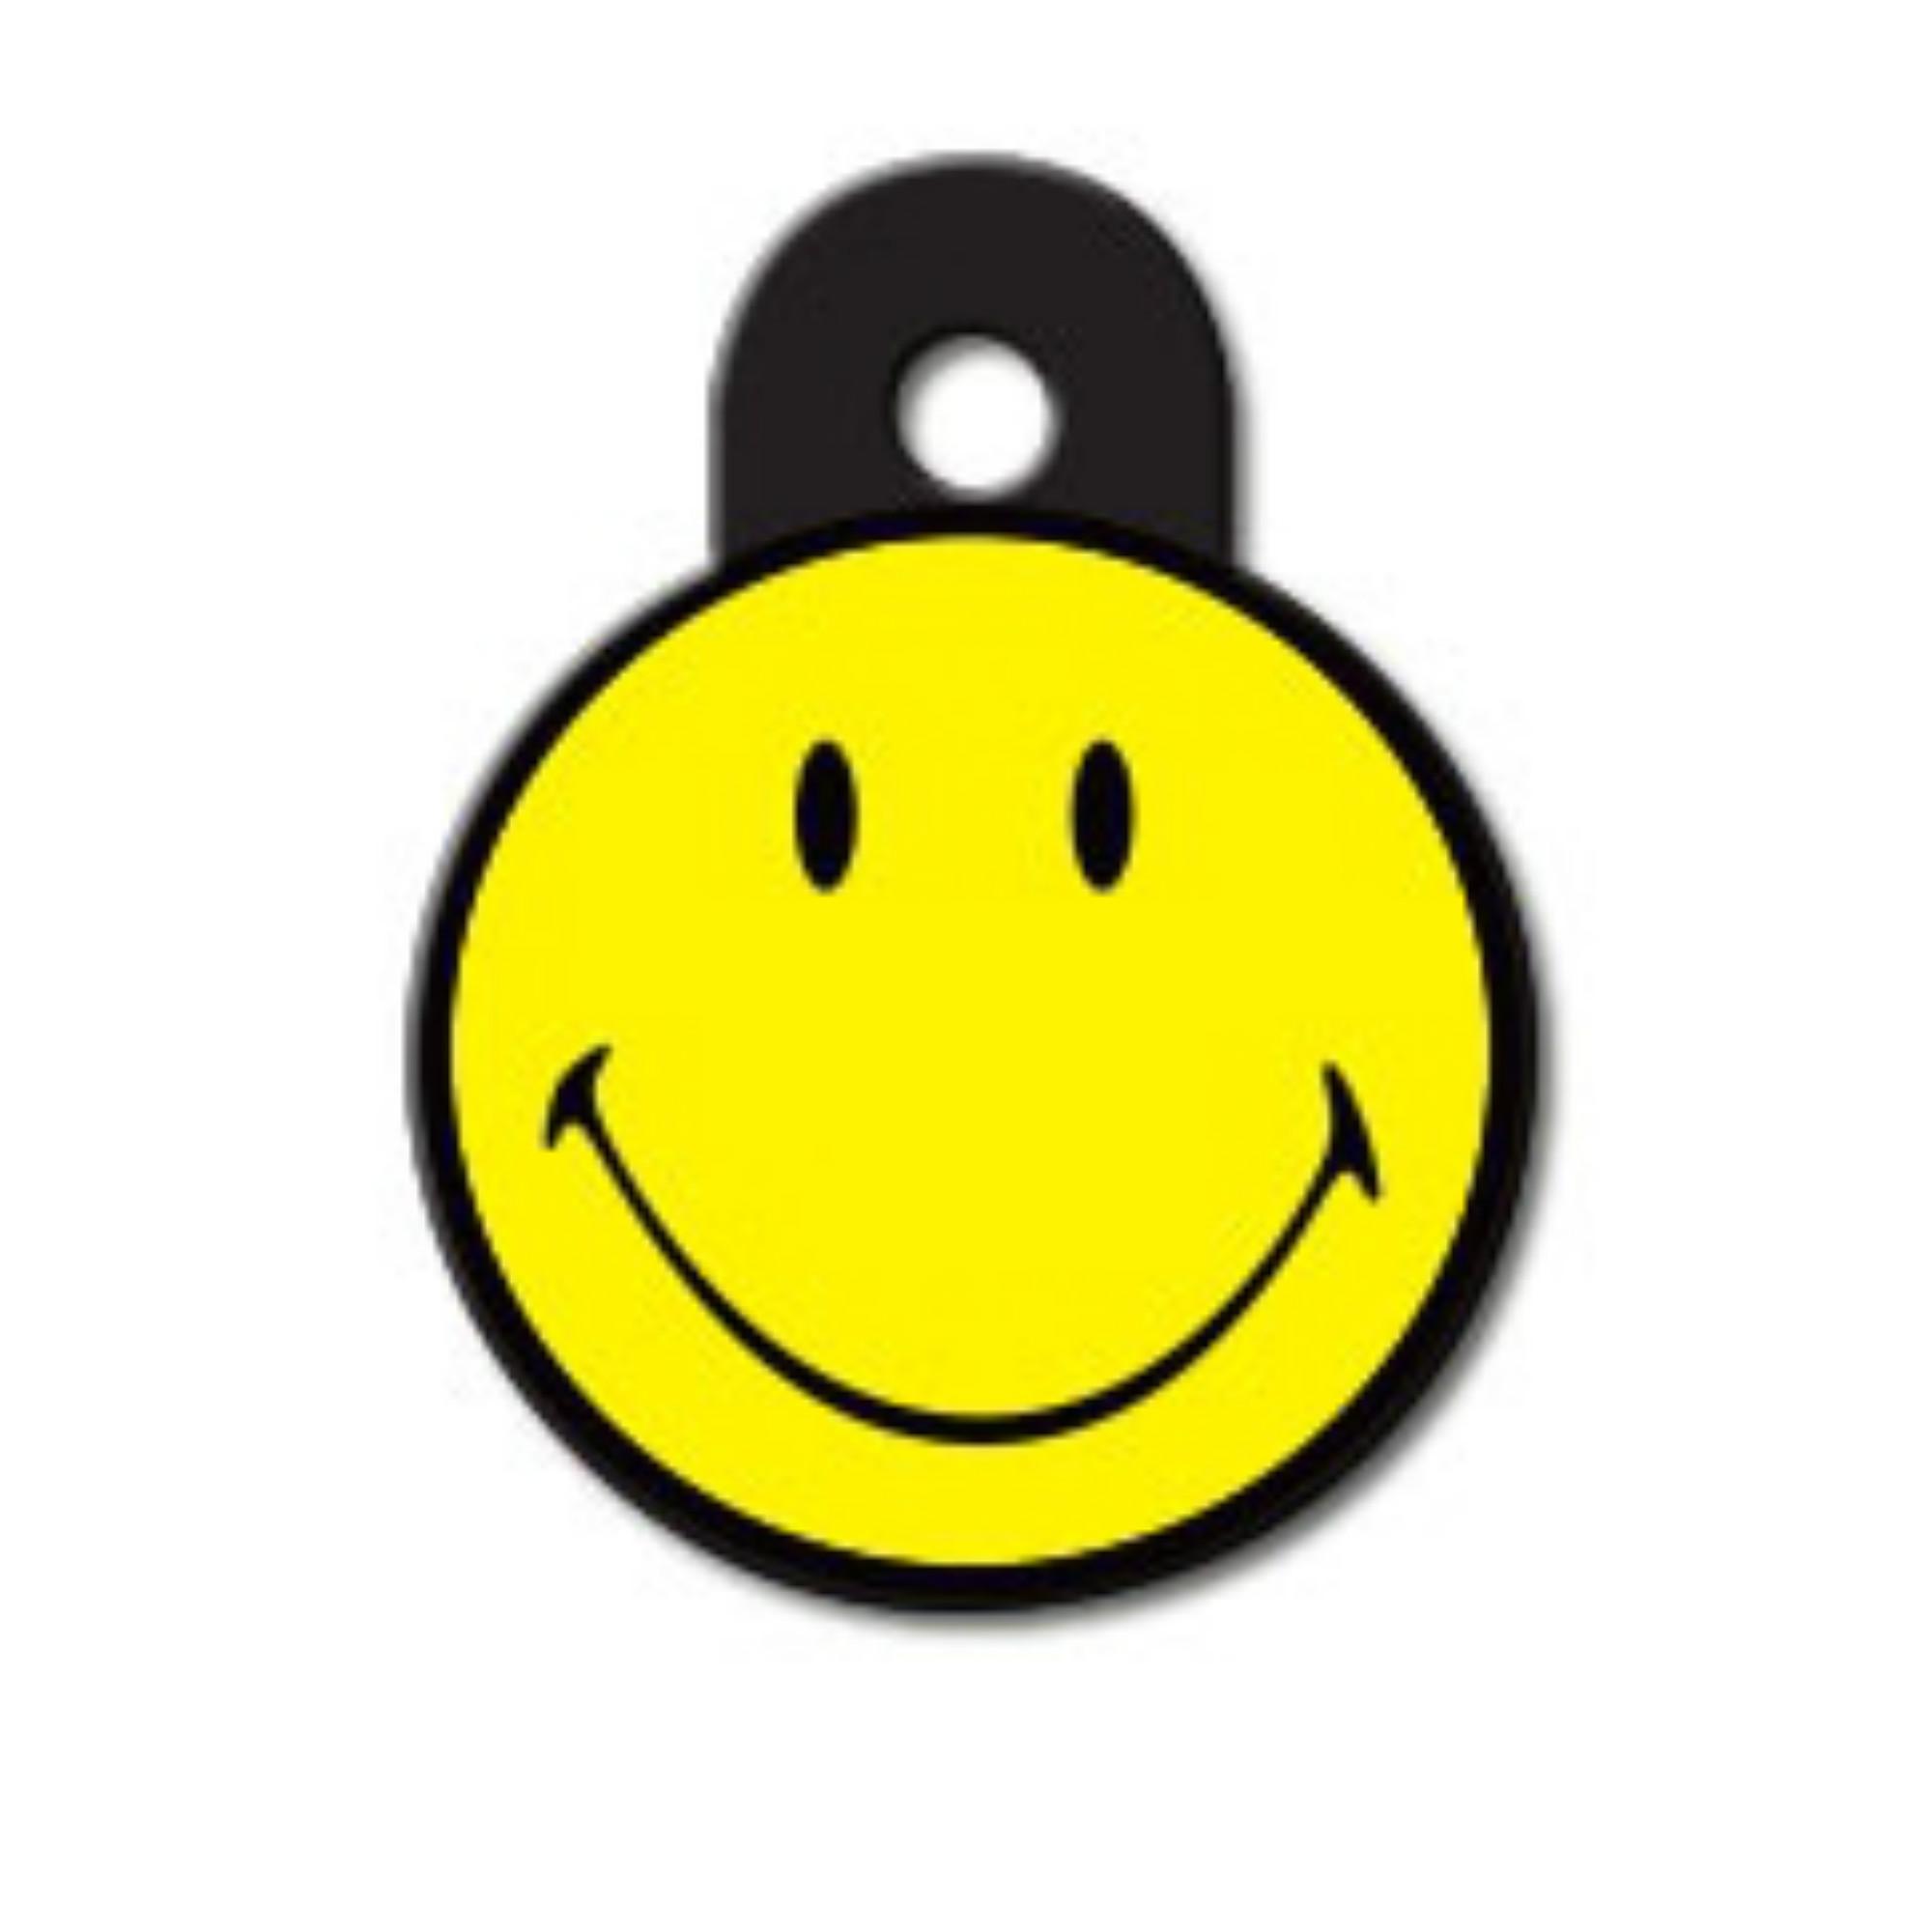 Large Circle Engravable Pet I.D. Tag - Original Smiley Face